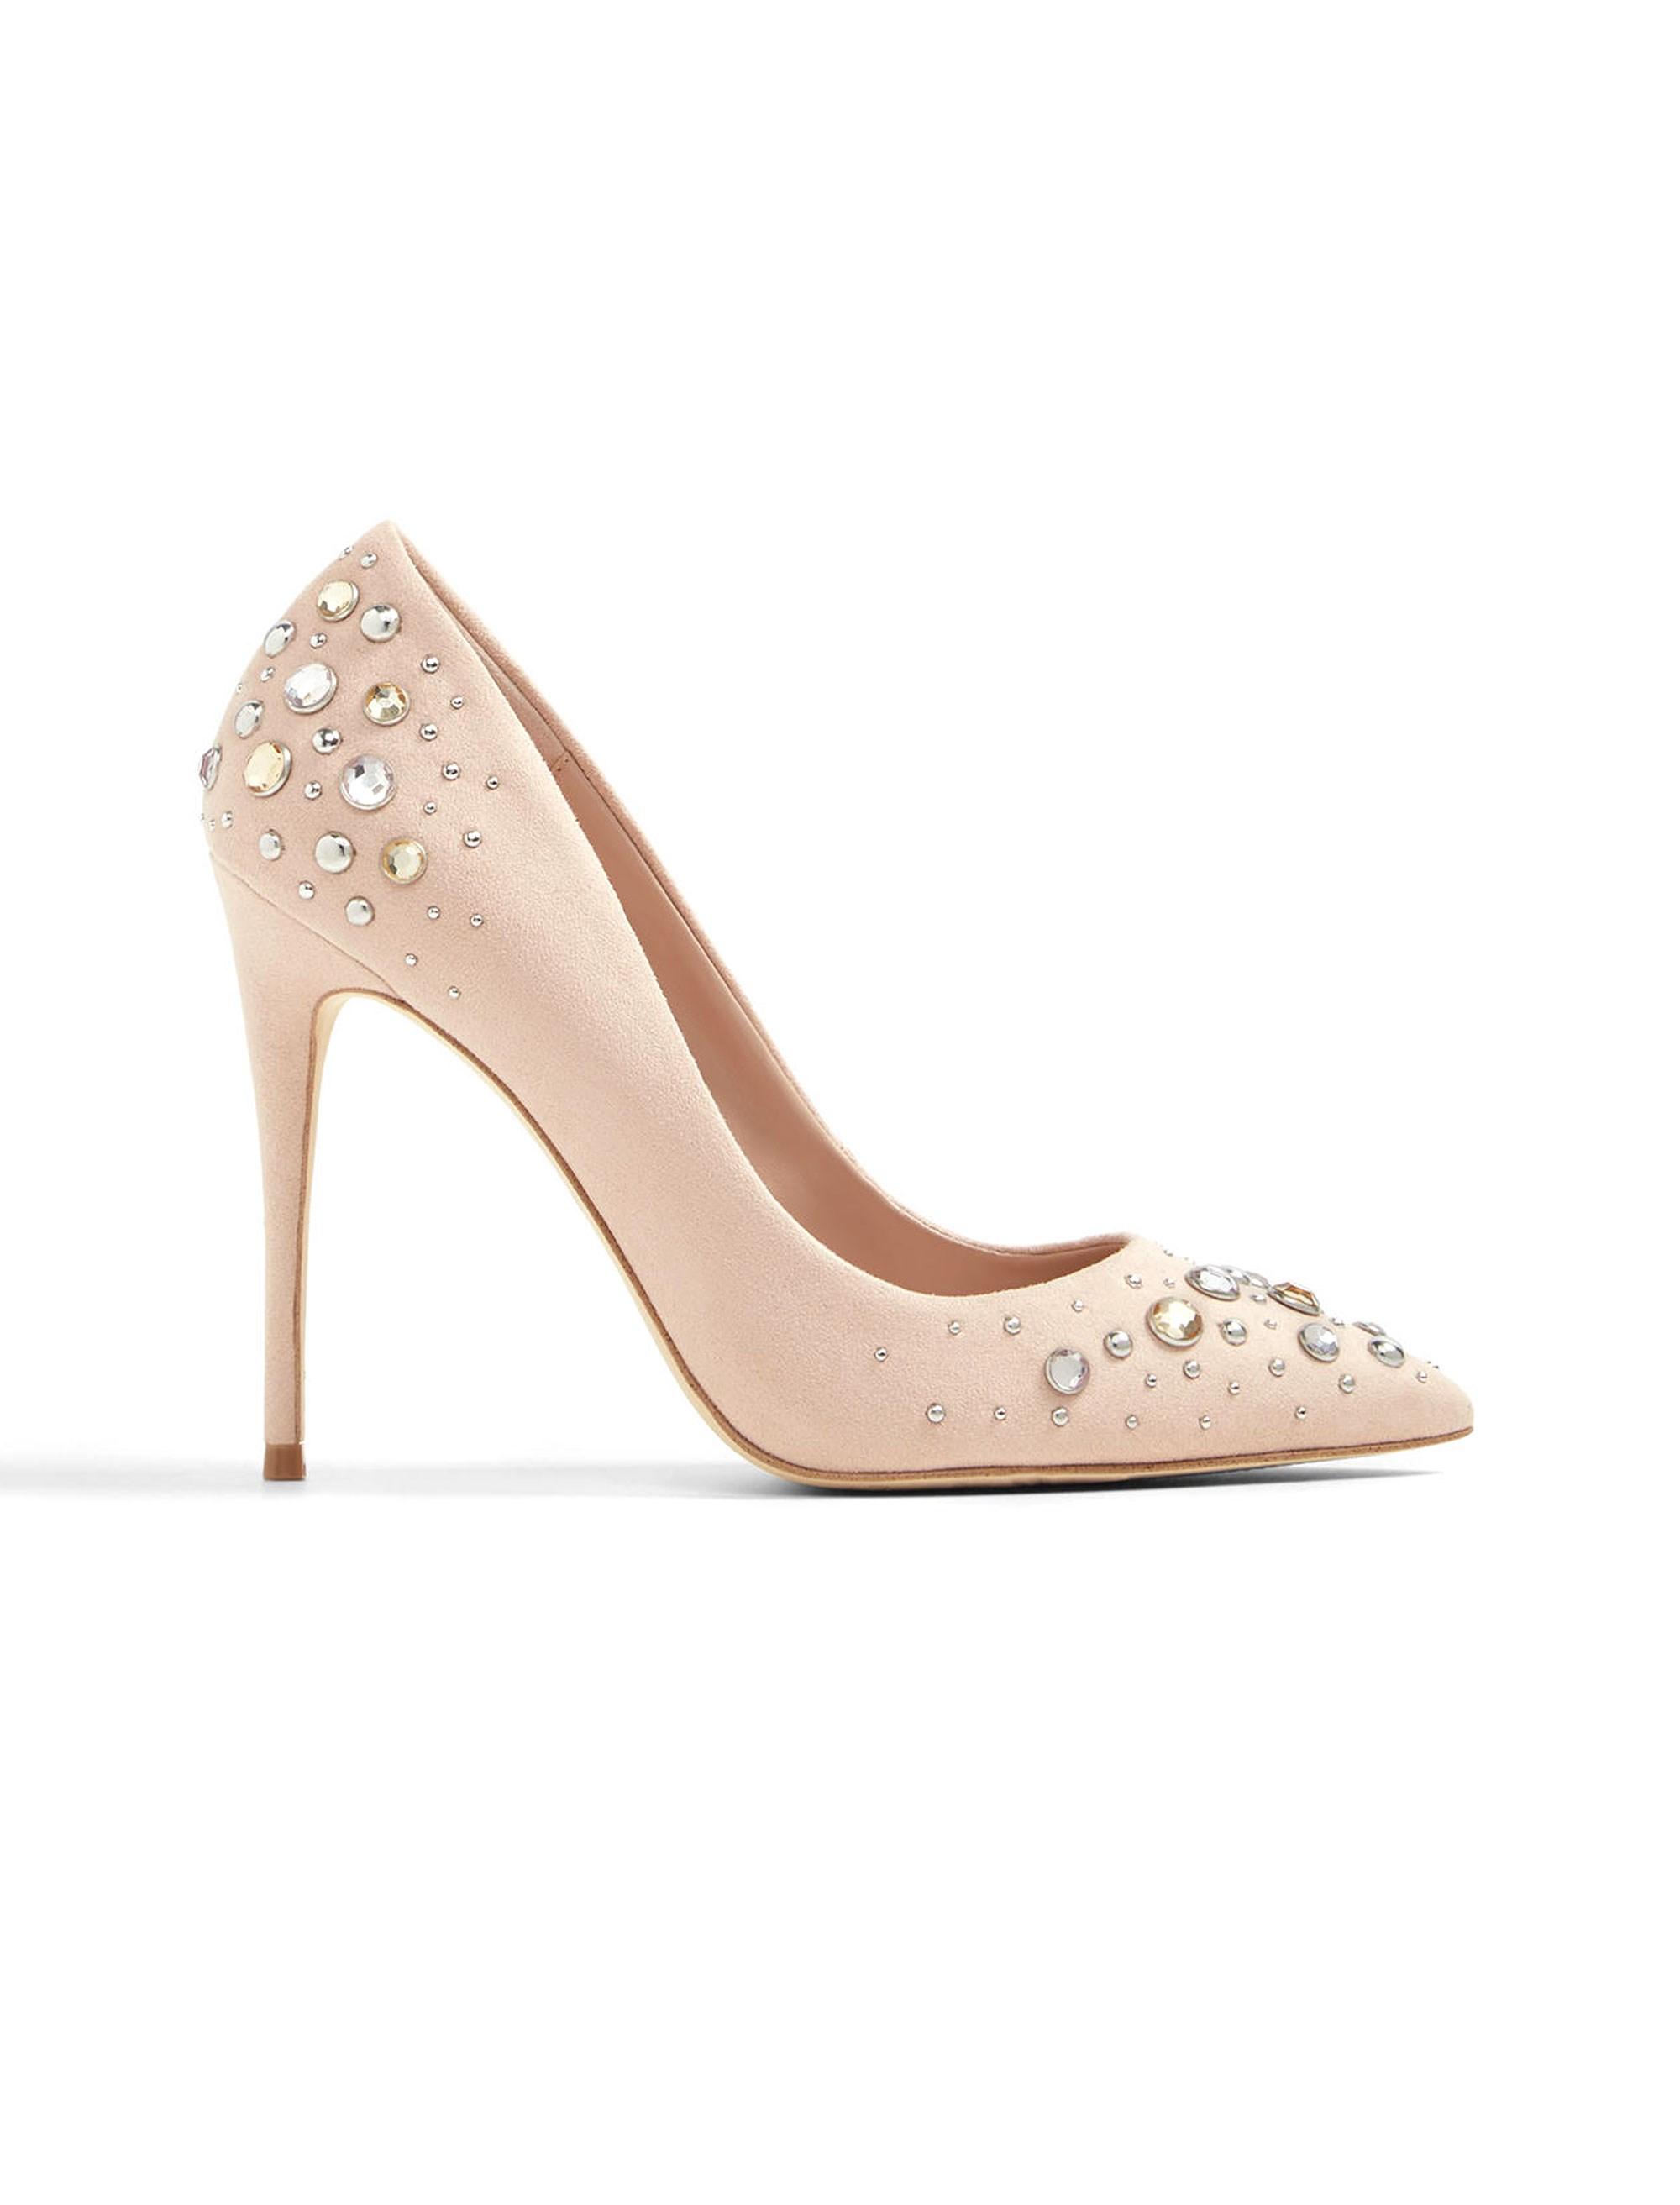 کفش پاشنه بلند زنانه - کرم صورتي - 1